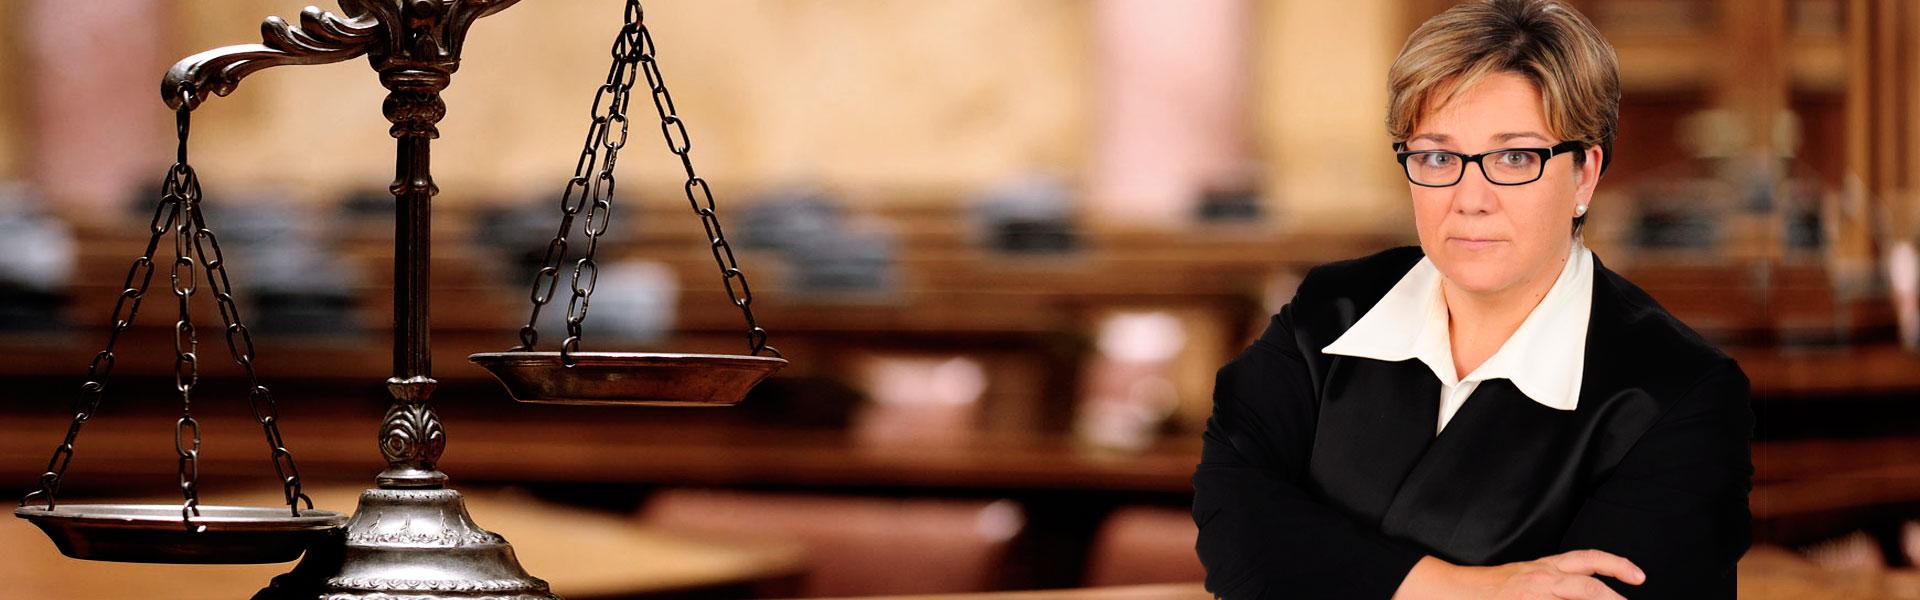 abogado barato Extranjeria en Madrid